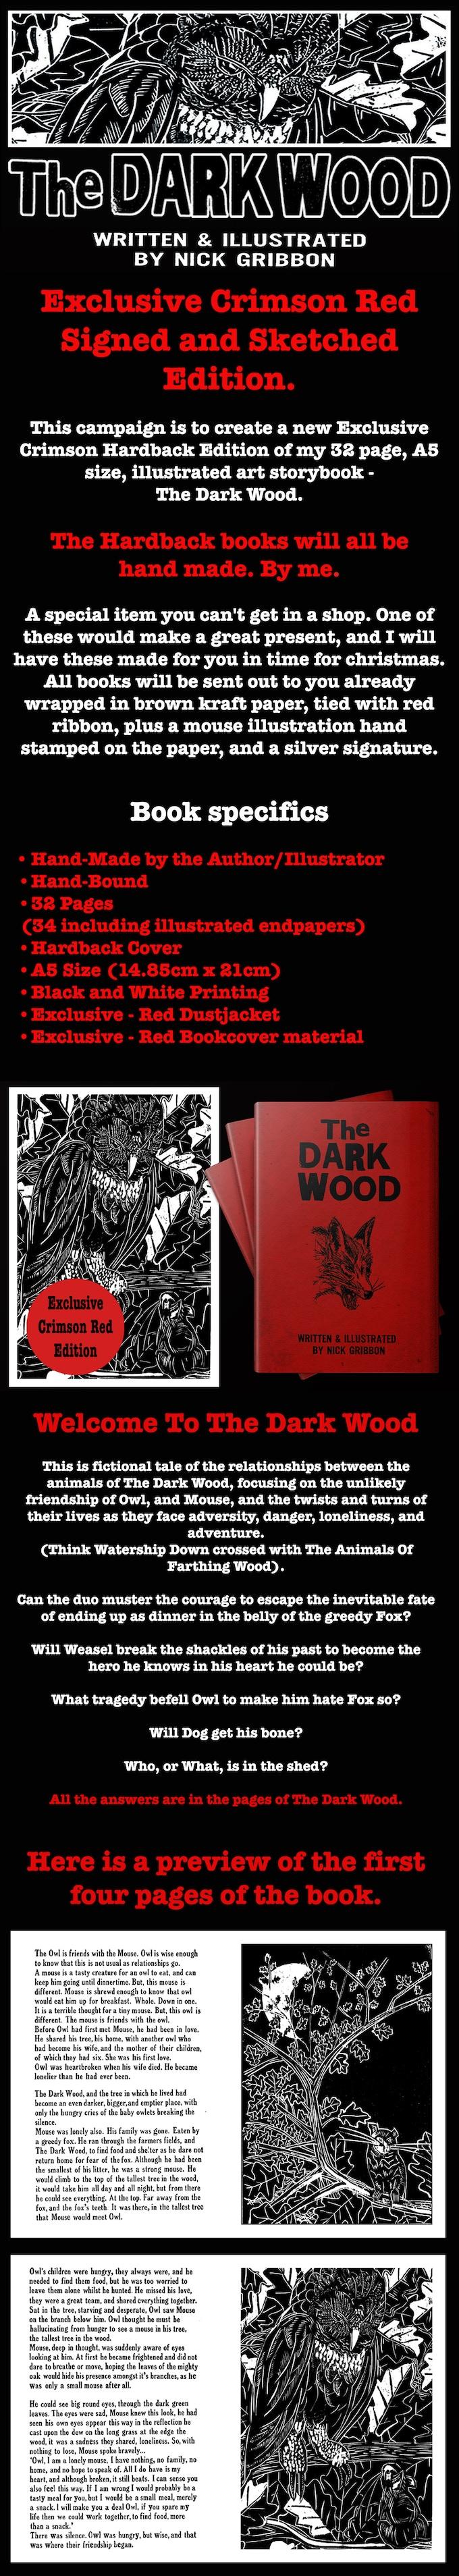 The Dark Wood Hand Bound Book Exclusive Crimson Edition By Nick